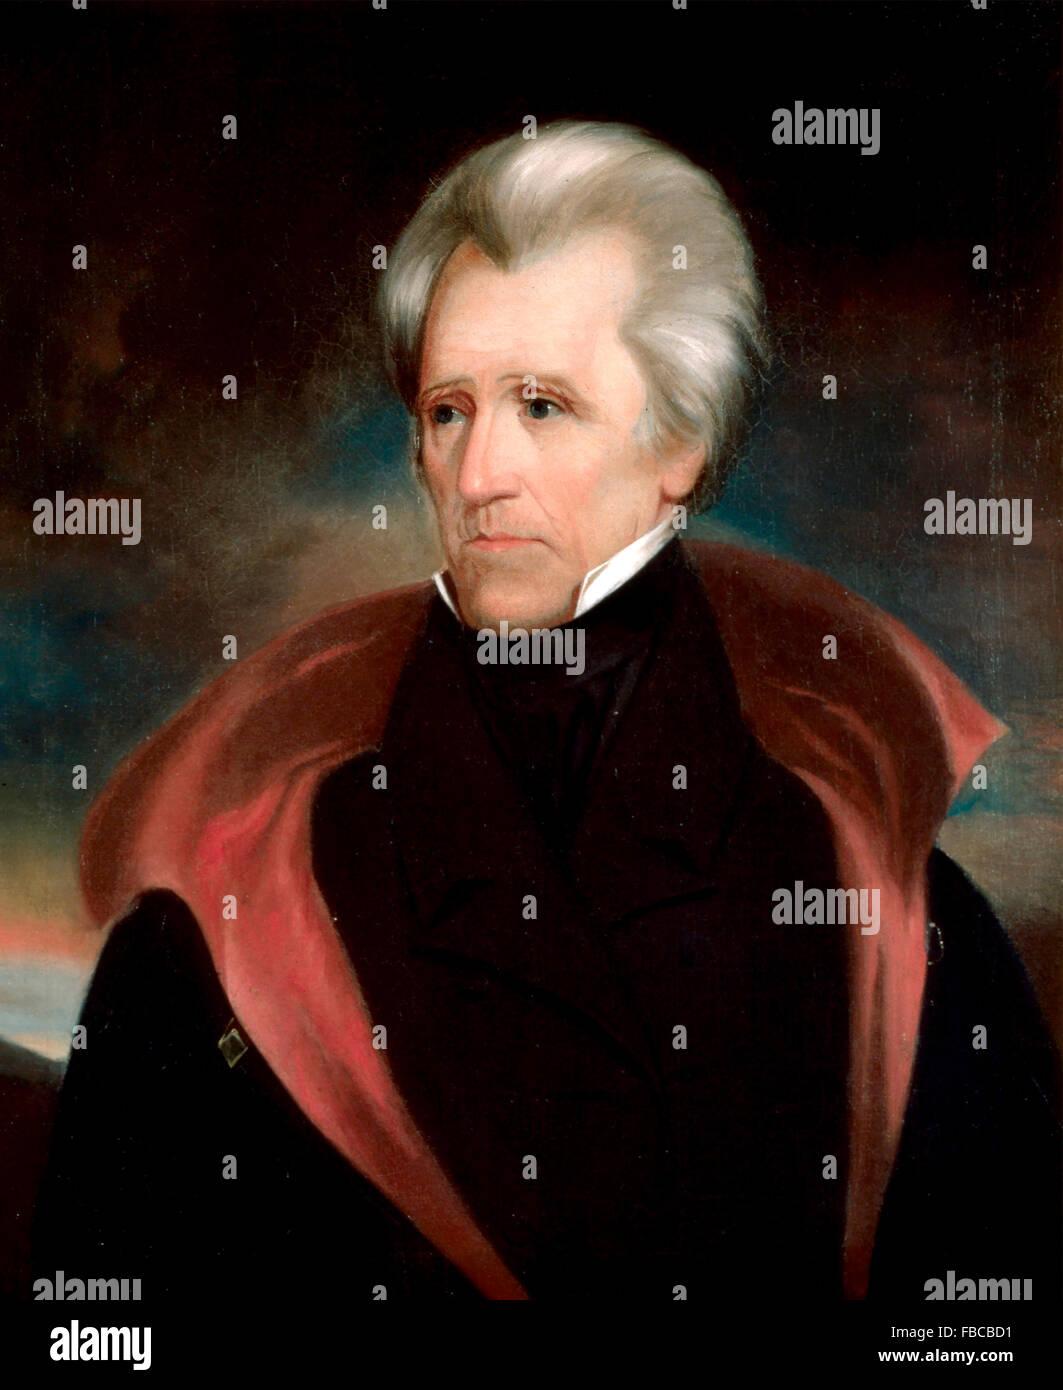 Andrew Jackson. Portrait of the 7th US President by Ralph Eleazer Whiteside Earl - Stock Image